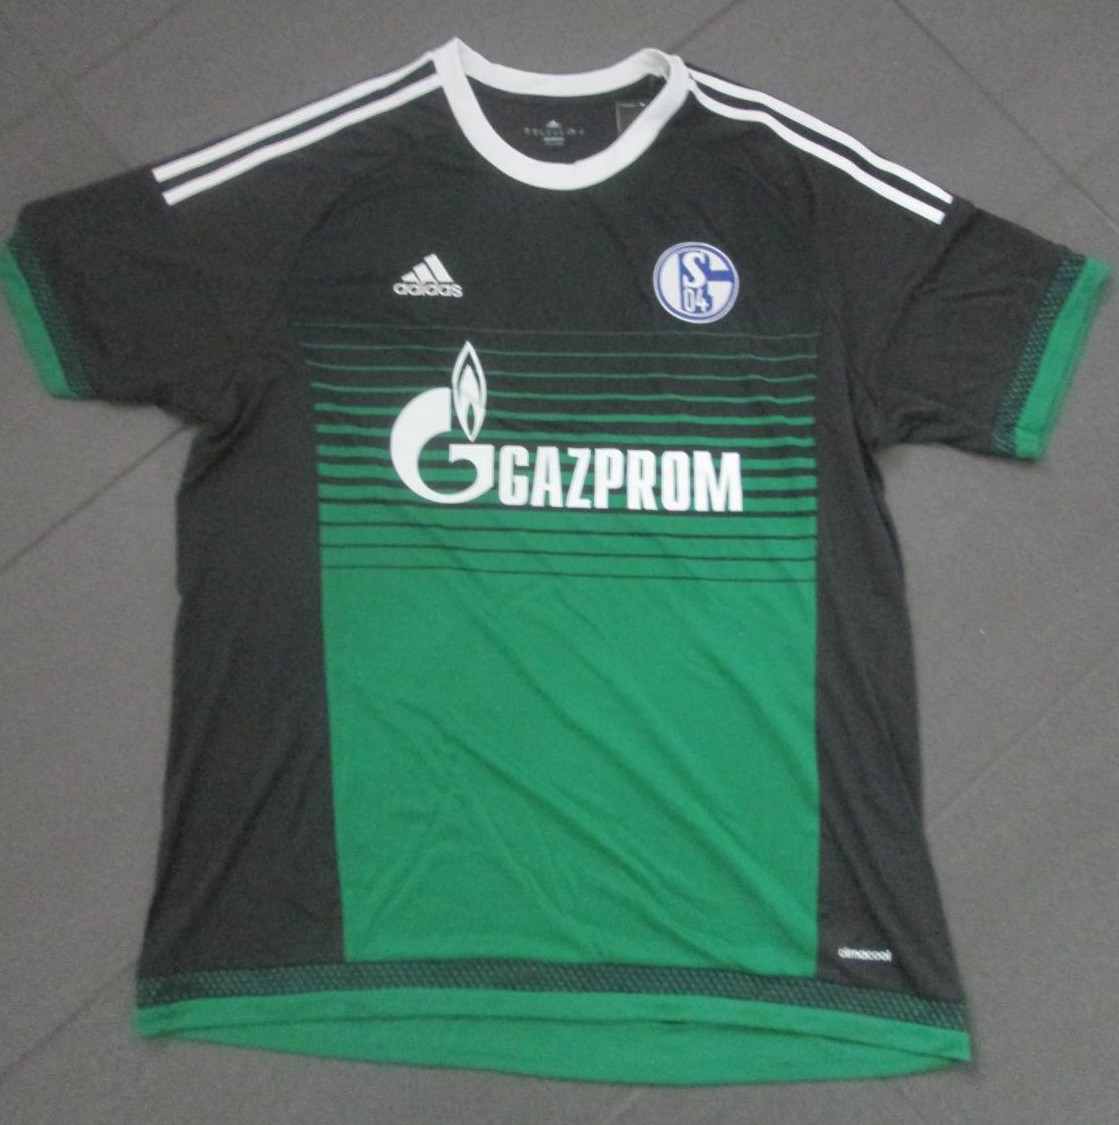 FC Schalke 04 Third football shirt 2015 - 2016. Sponsored by Gazprom